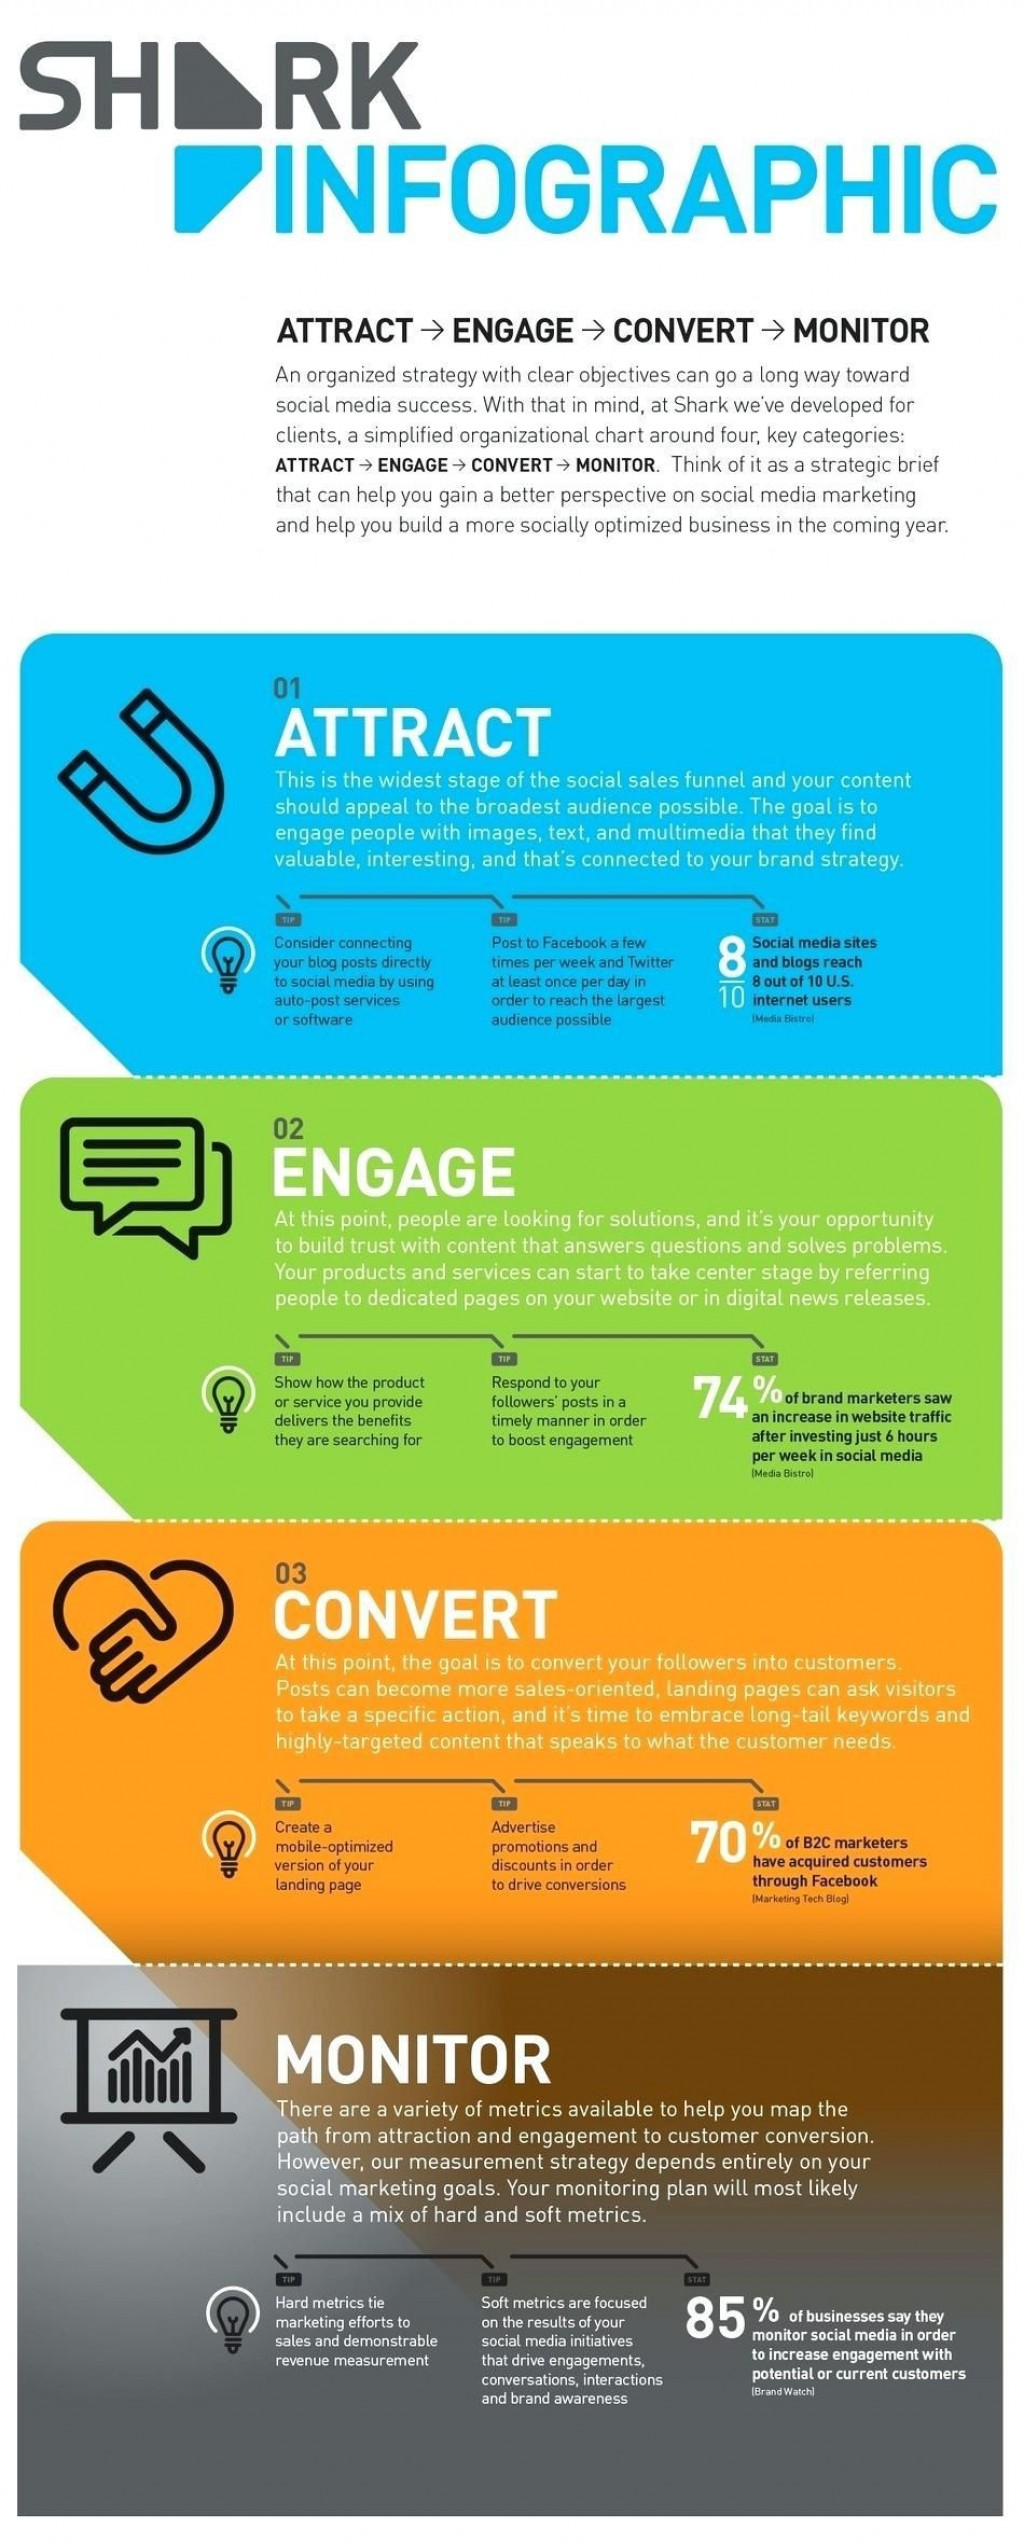 002 Striking Digital Marketing Busines Plan Sample High Definition  TemplateLarge